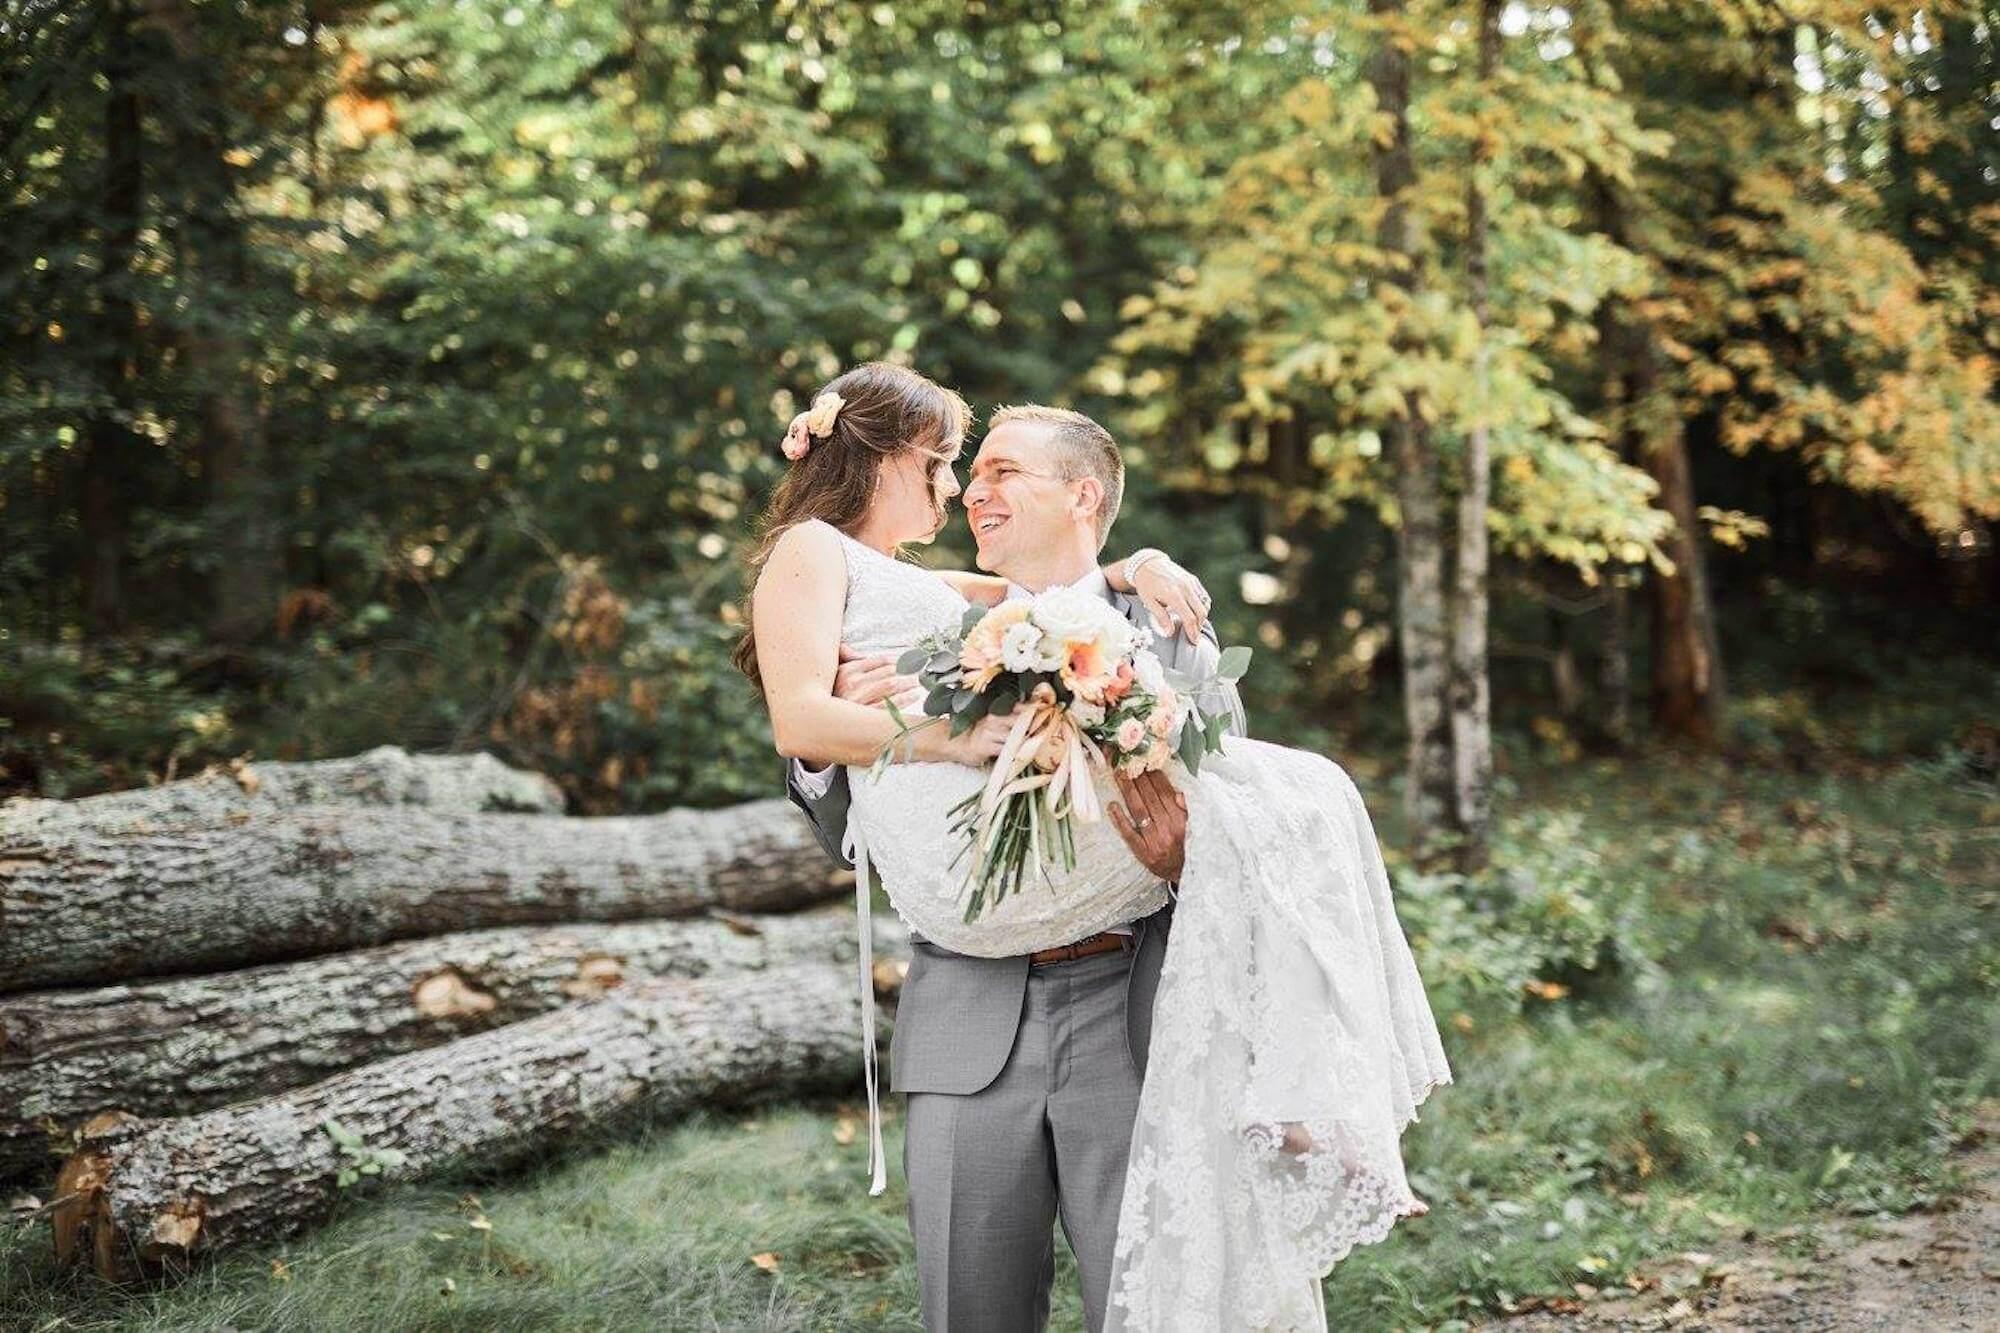 engle-olson-wedding-video-perry-james-photography-52.jpg